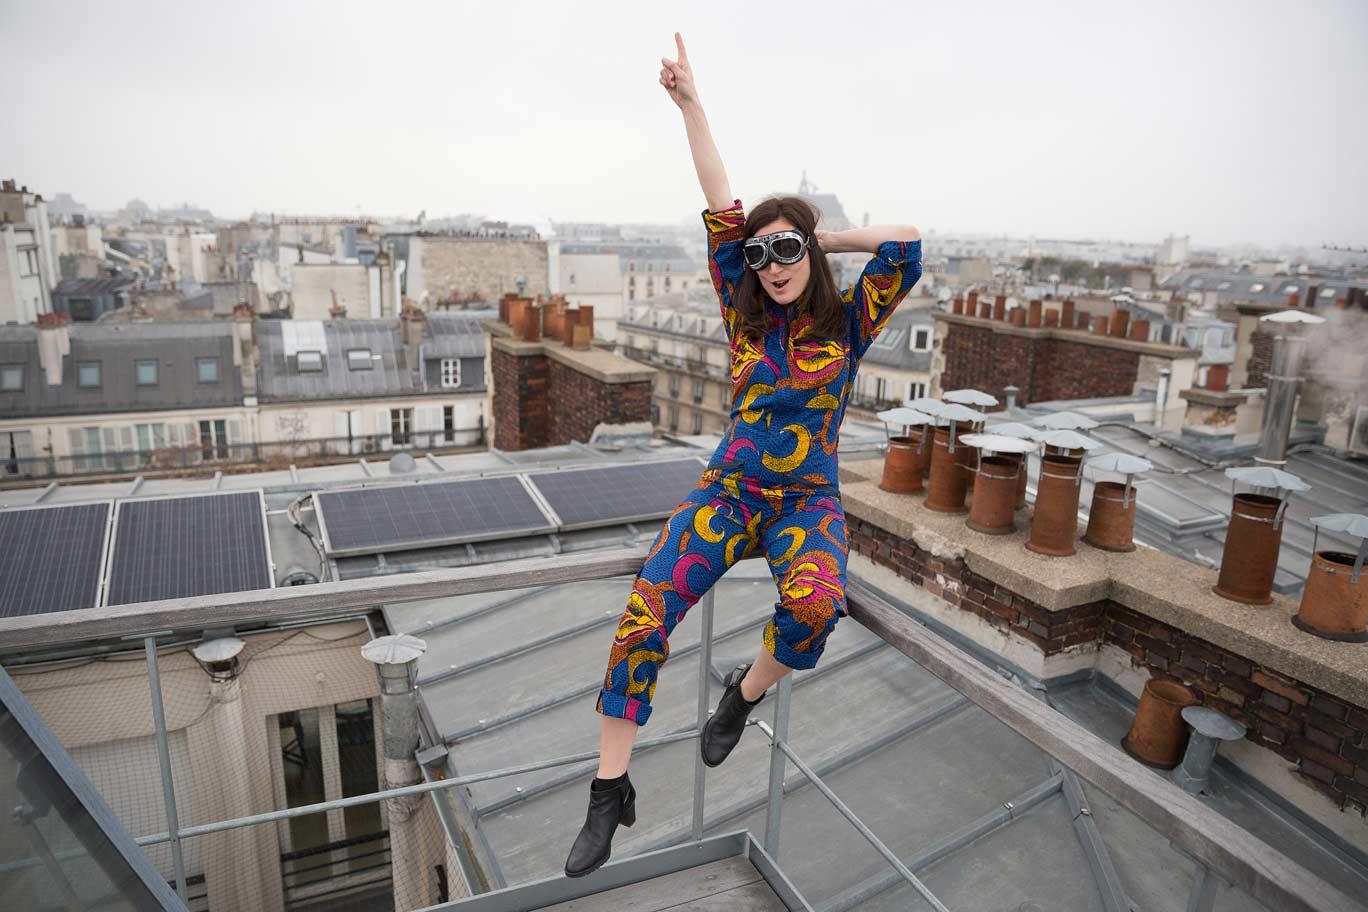 Ines-Aramburo-photographe-paris-portrait-lifestyle-seance-photo-photoshoot-photographer24.jpg